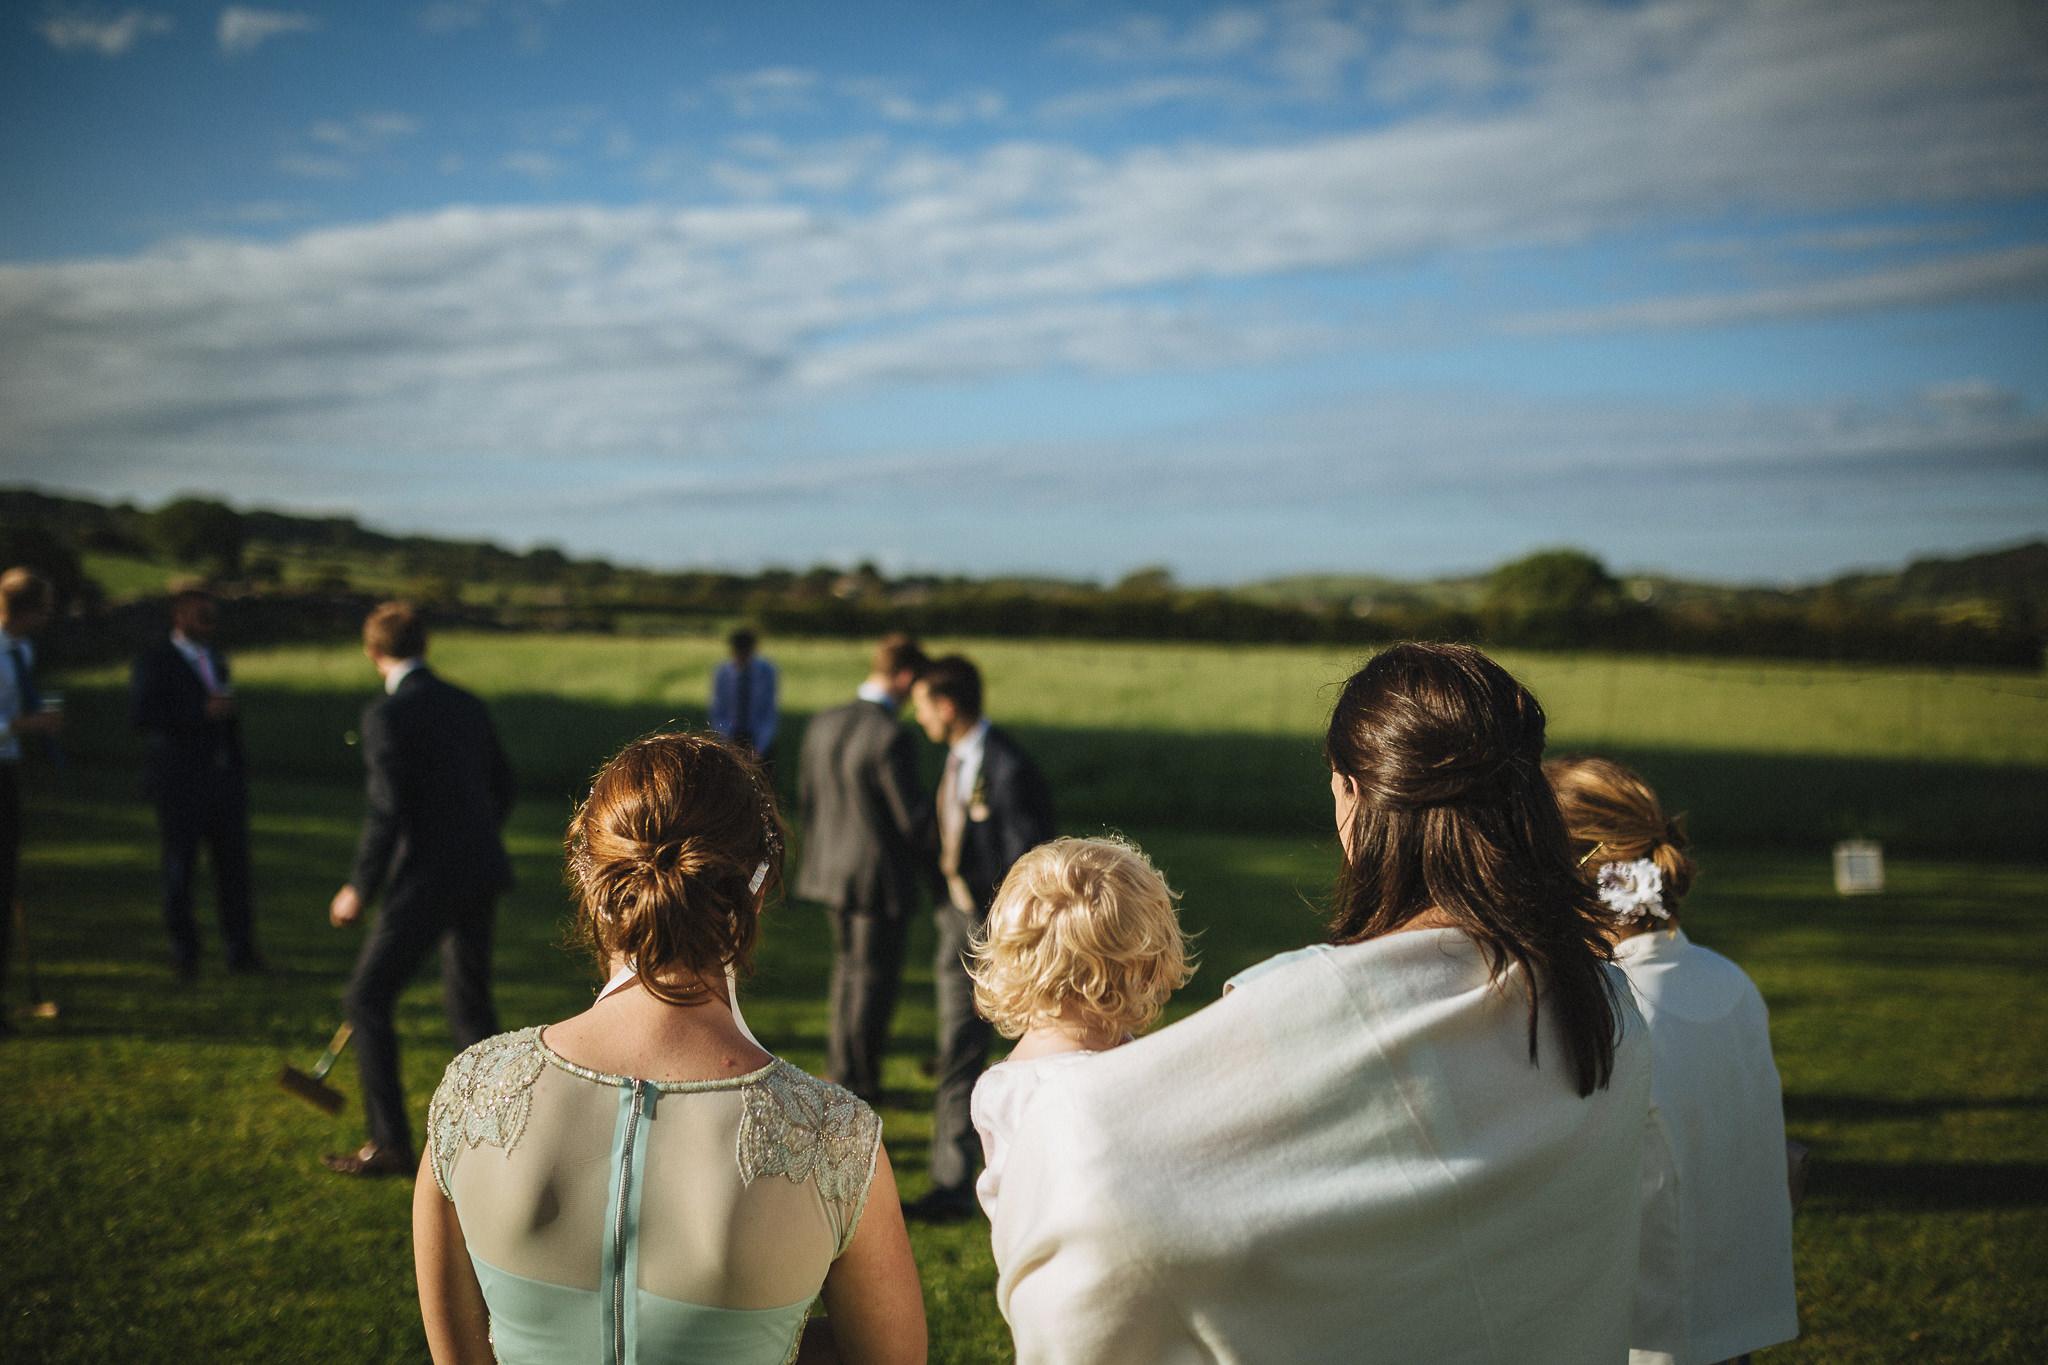 paul-marbrook-Farm-Wedding-Photographer-Lancashire-90071